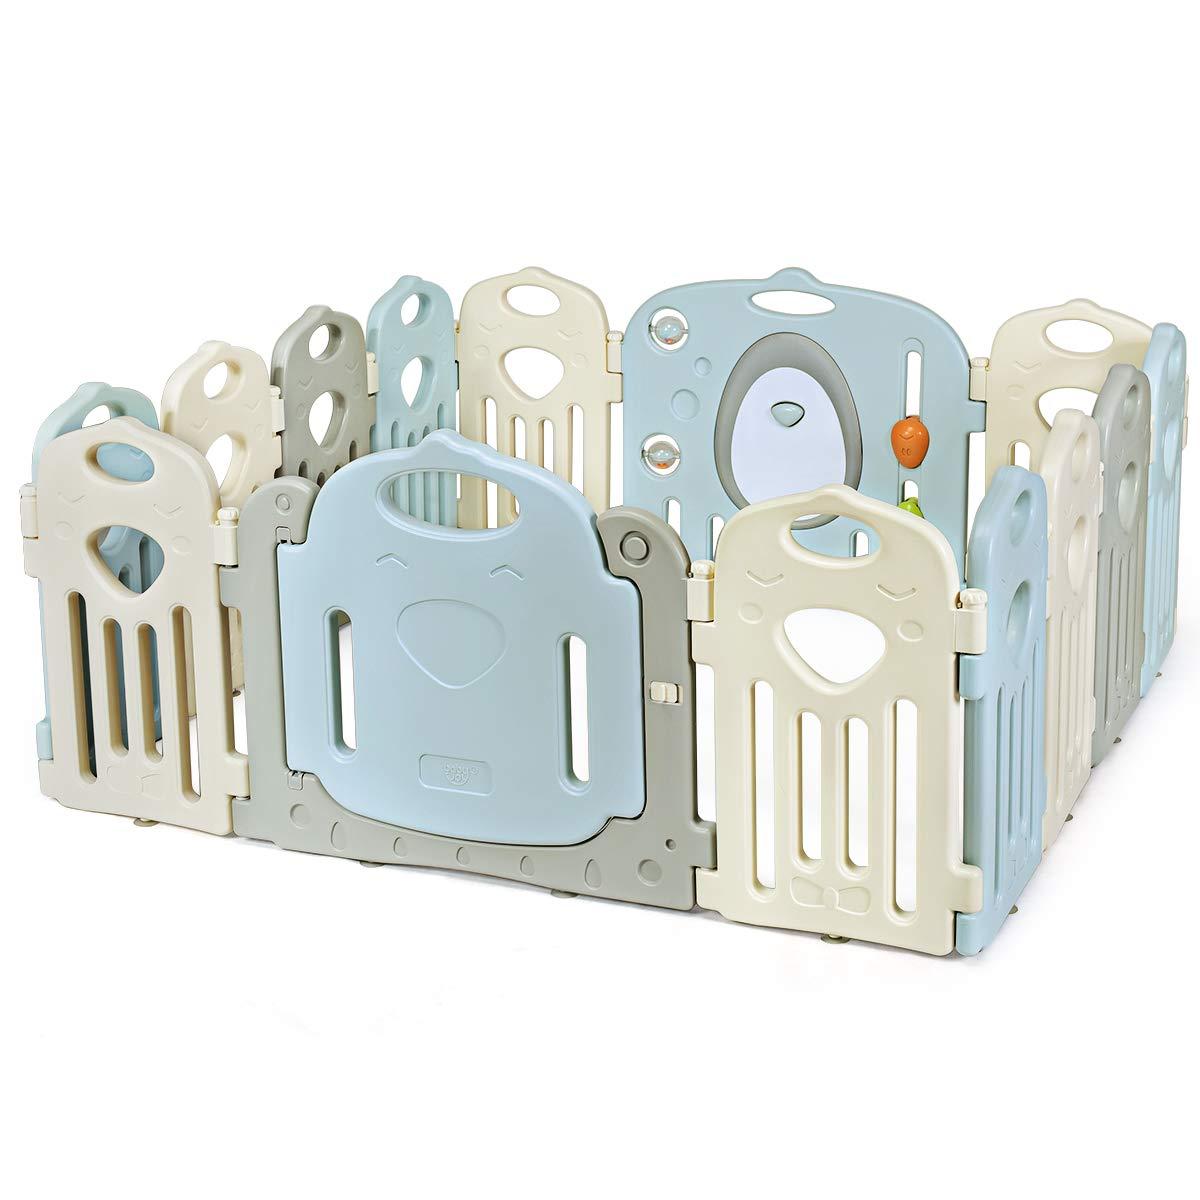 Costzon Baby Fence 14-Panel Baby Playpen, Kids Portable Play Yard Indoor Outdoor w/Walk-Through Locking Door, Game Panel, Non-Slip Rubber Mats, Adjustable Shape for Children Toddlers